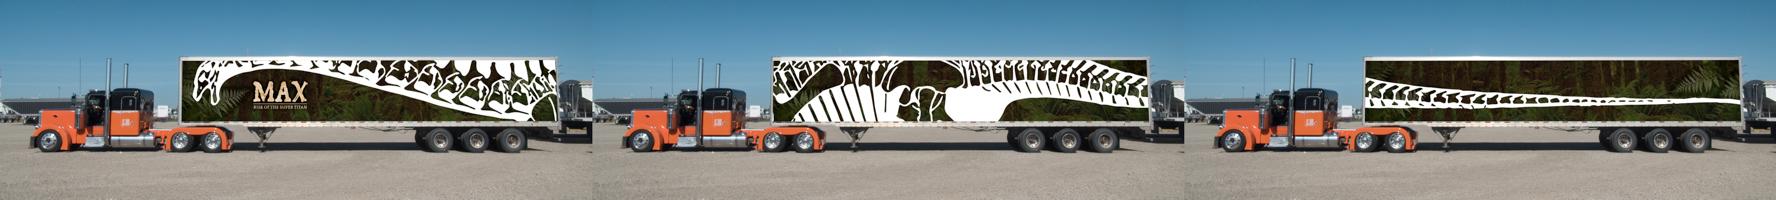 MAXIMUS Truck Convoy